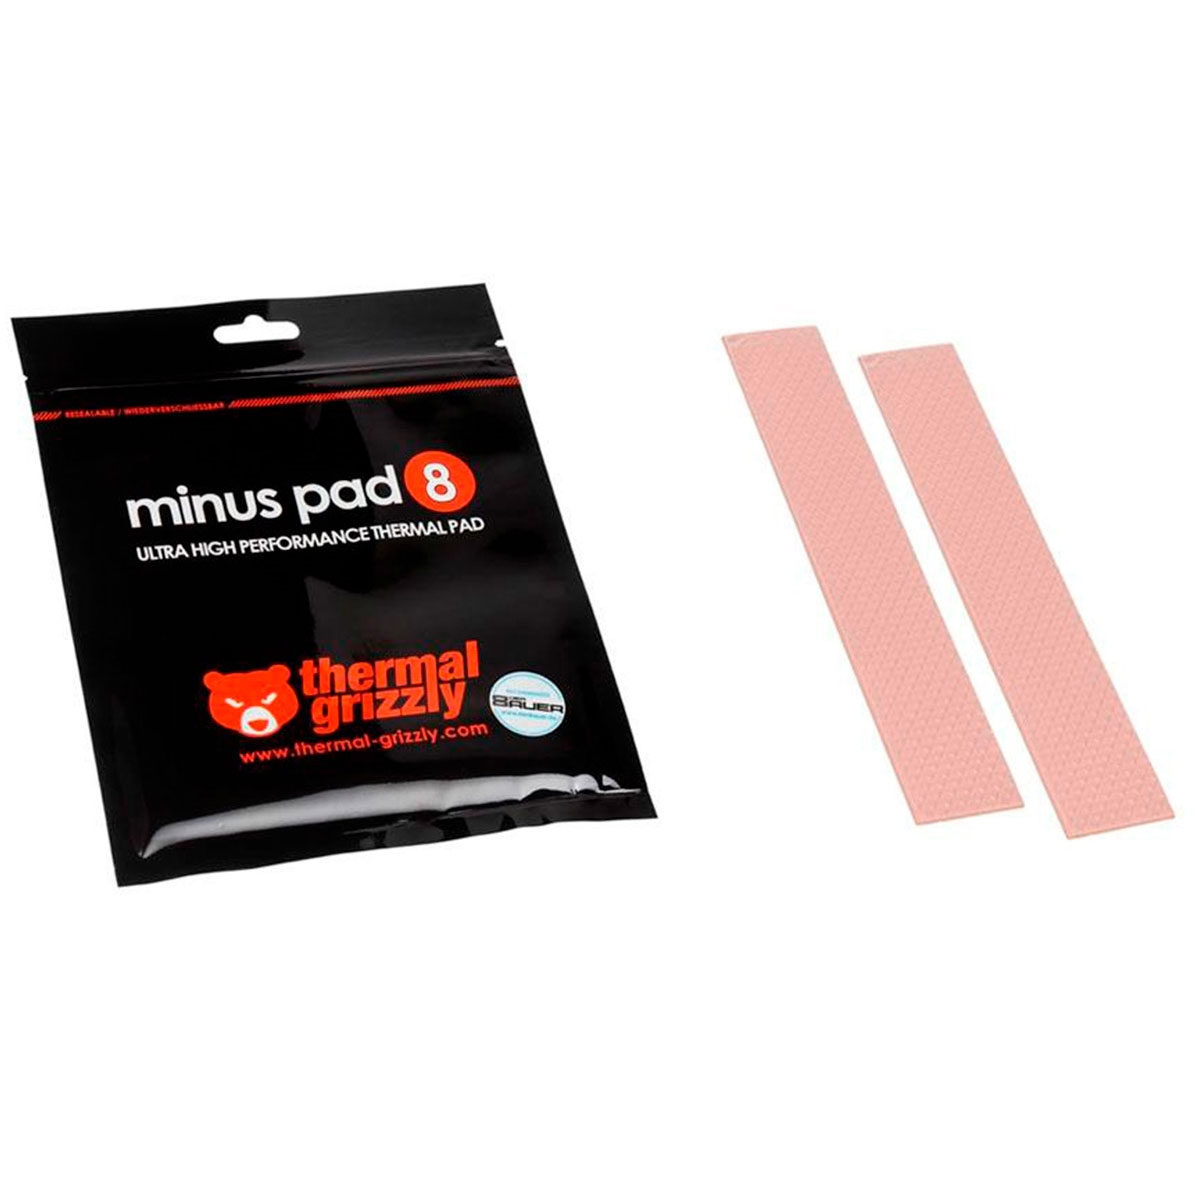 Pad Térmico Thermal Grizzly Minus 8 120x20x0.5mm Overclock 8.0 Wmk